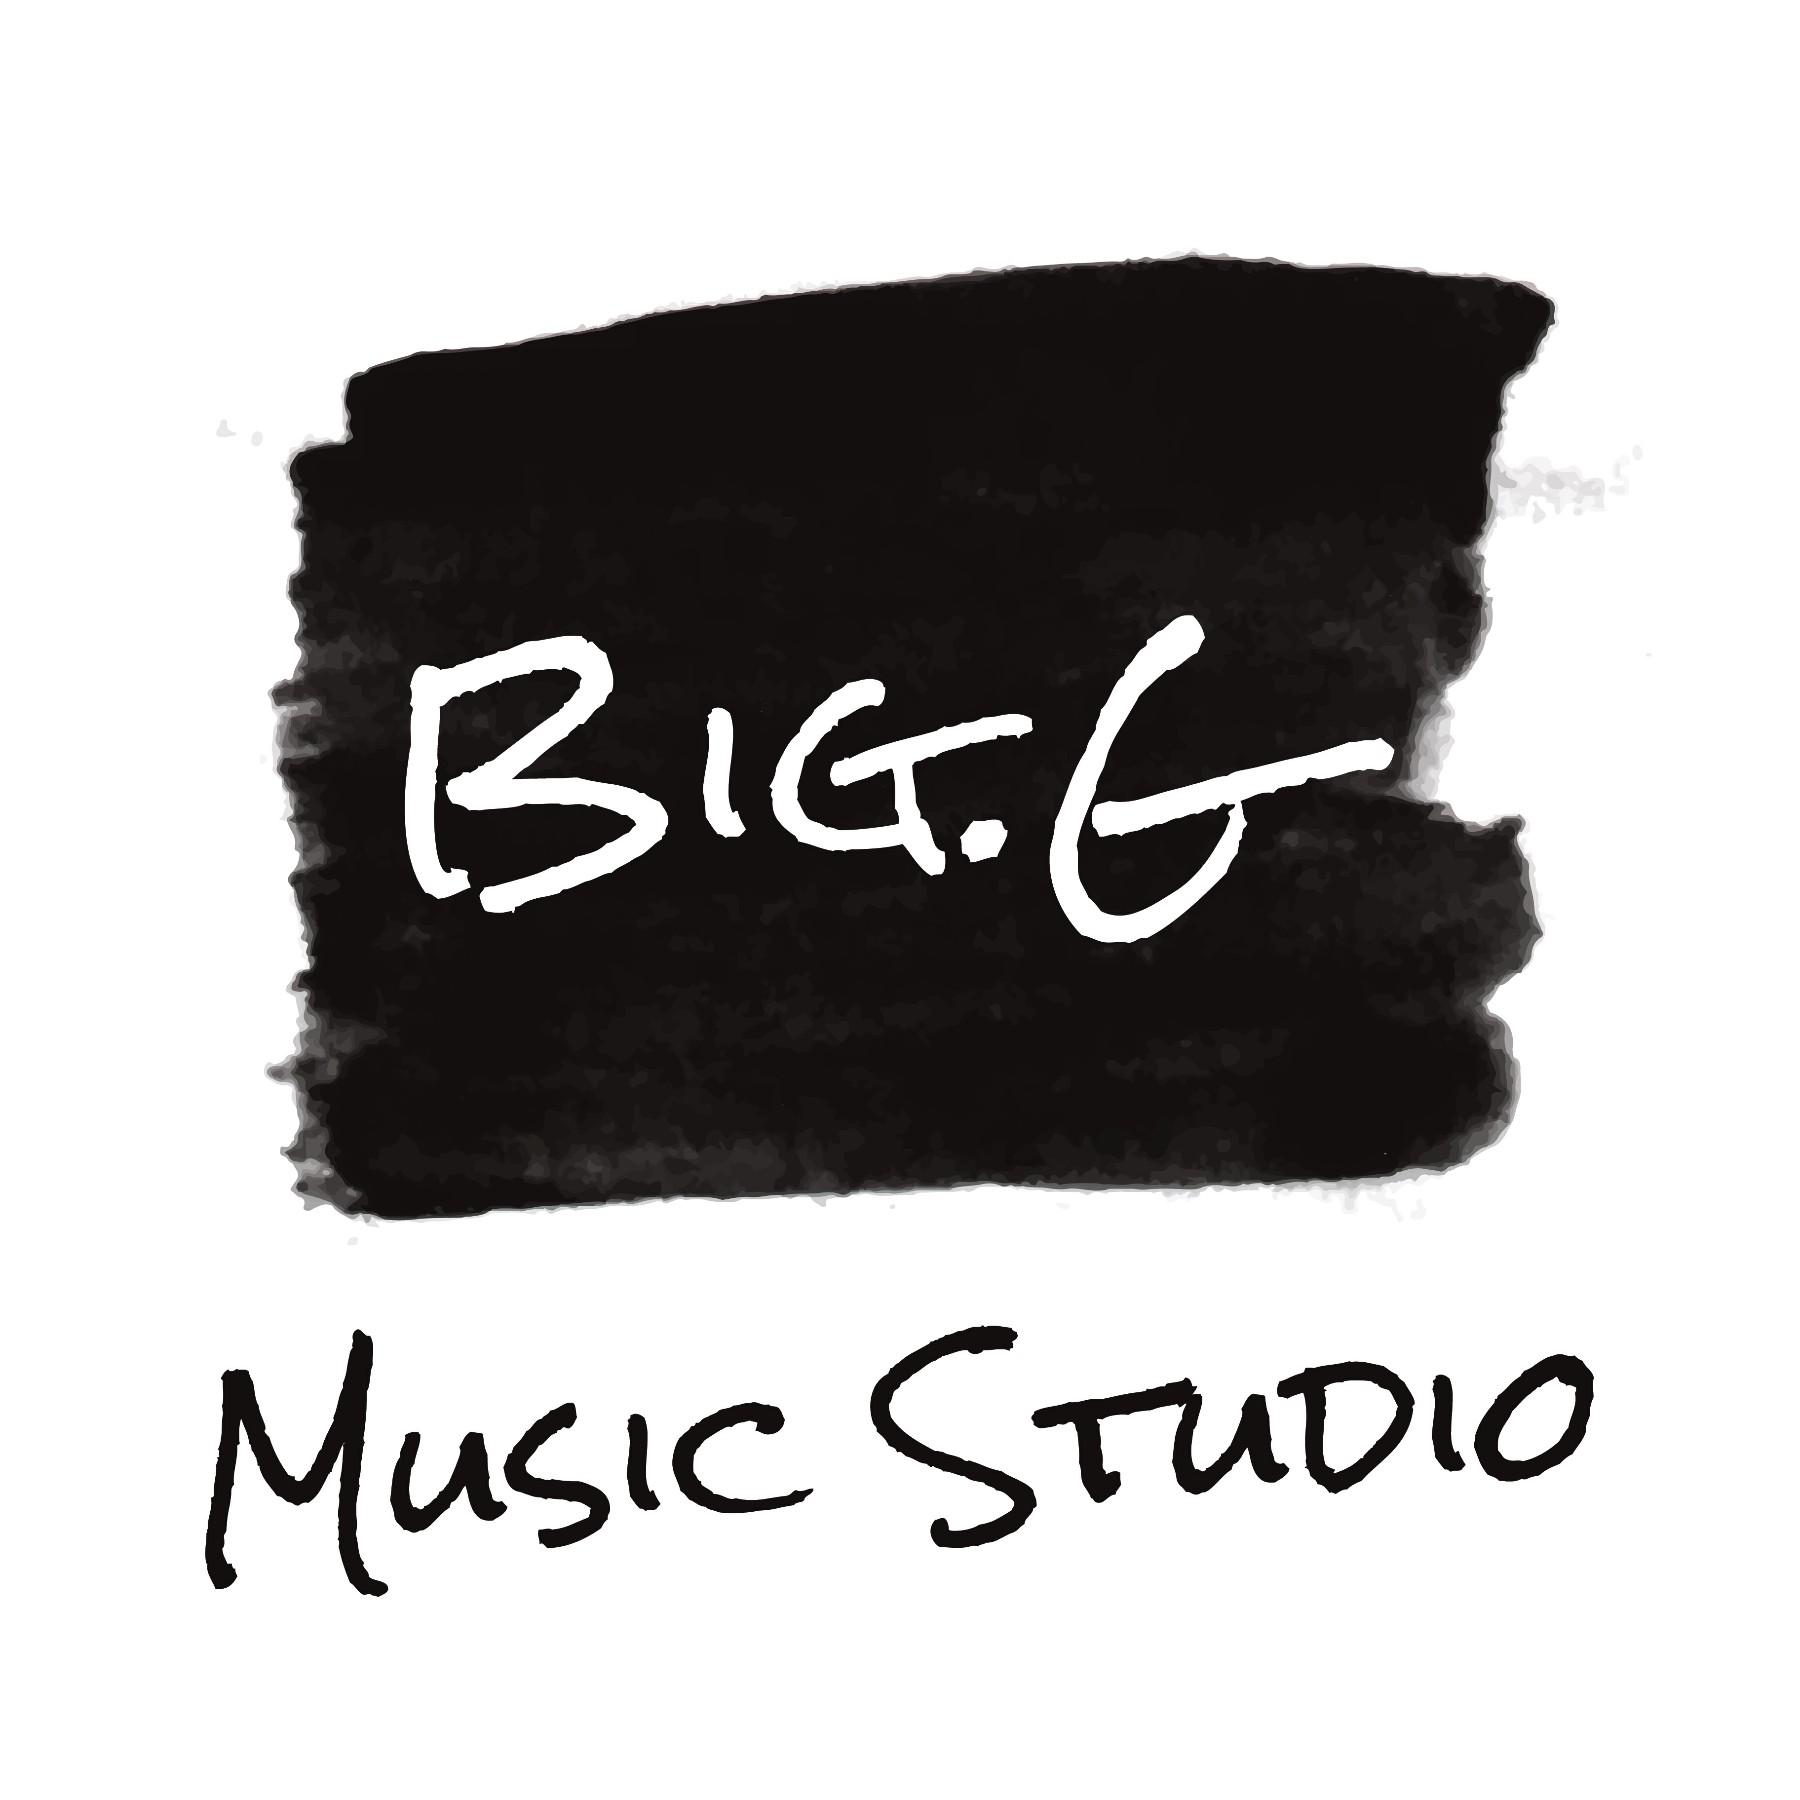 Big_G_Music